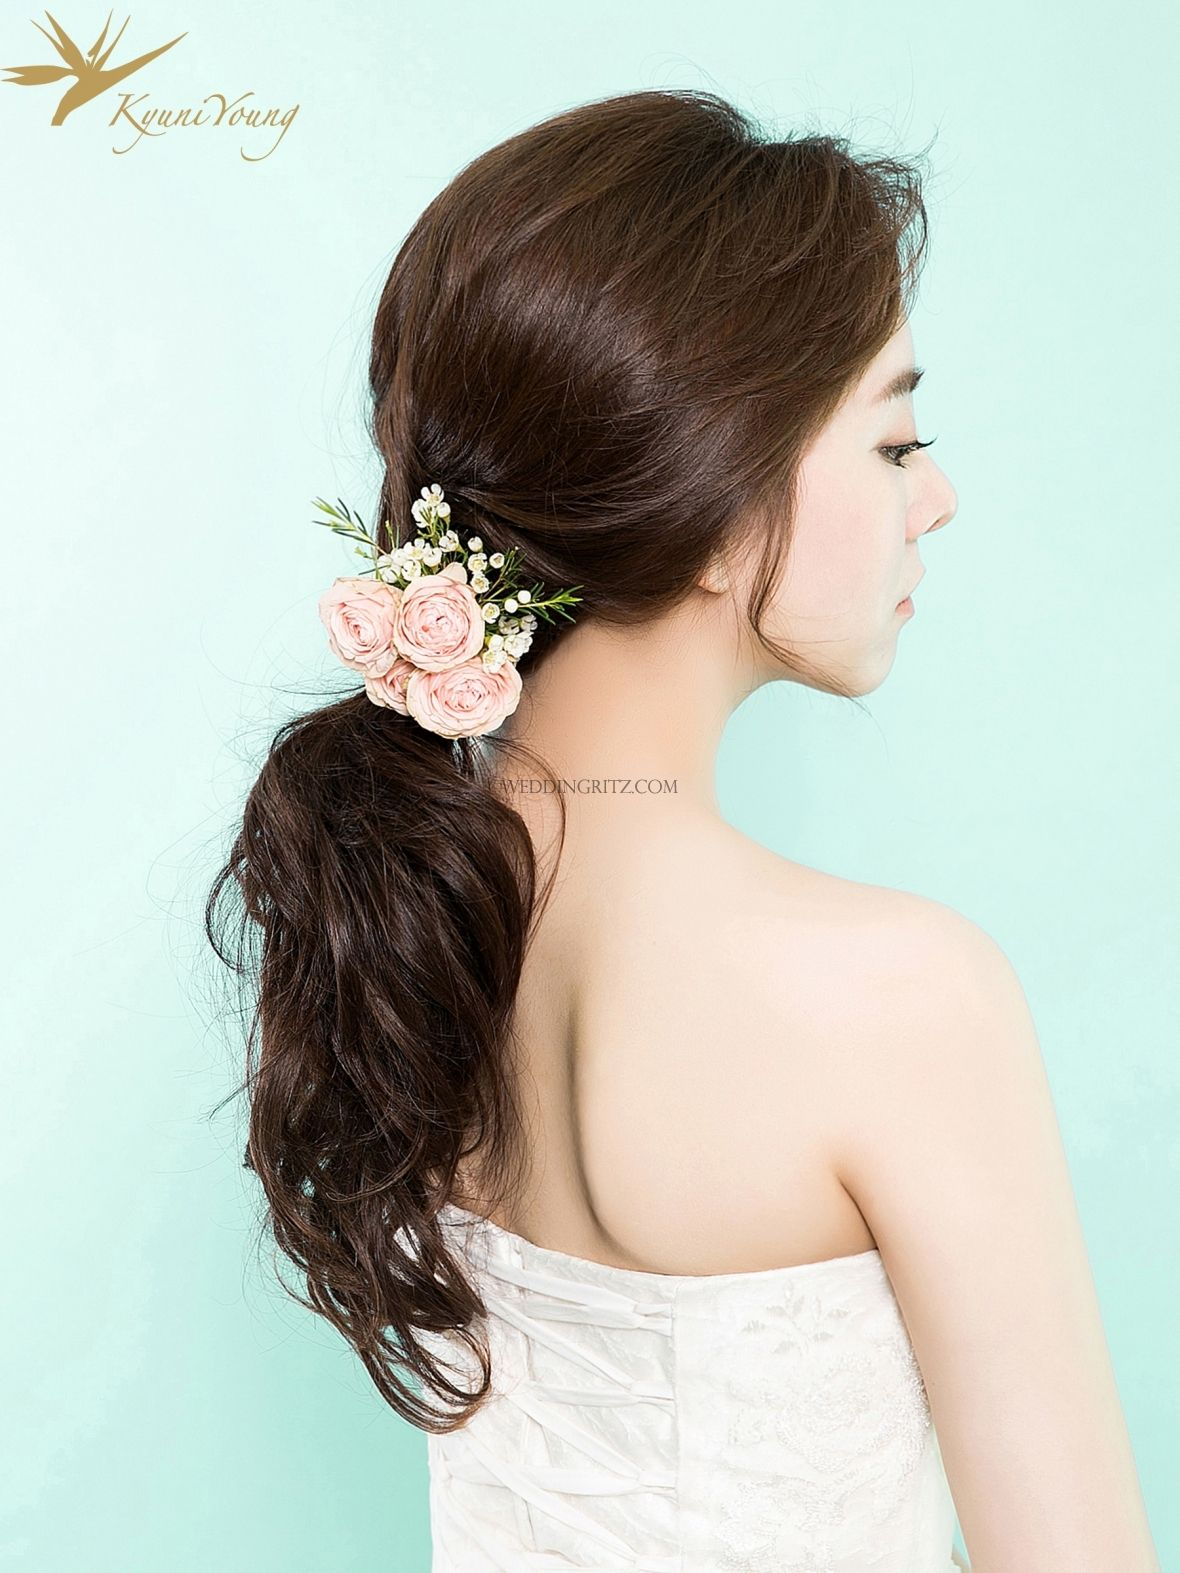 Beautiful Gyuniyoung The Pre Wedding Hair Make Up Salon In Korea Hairdo Wedding Hair Styles Bridal Hairdo